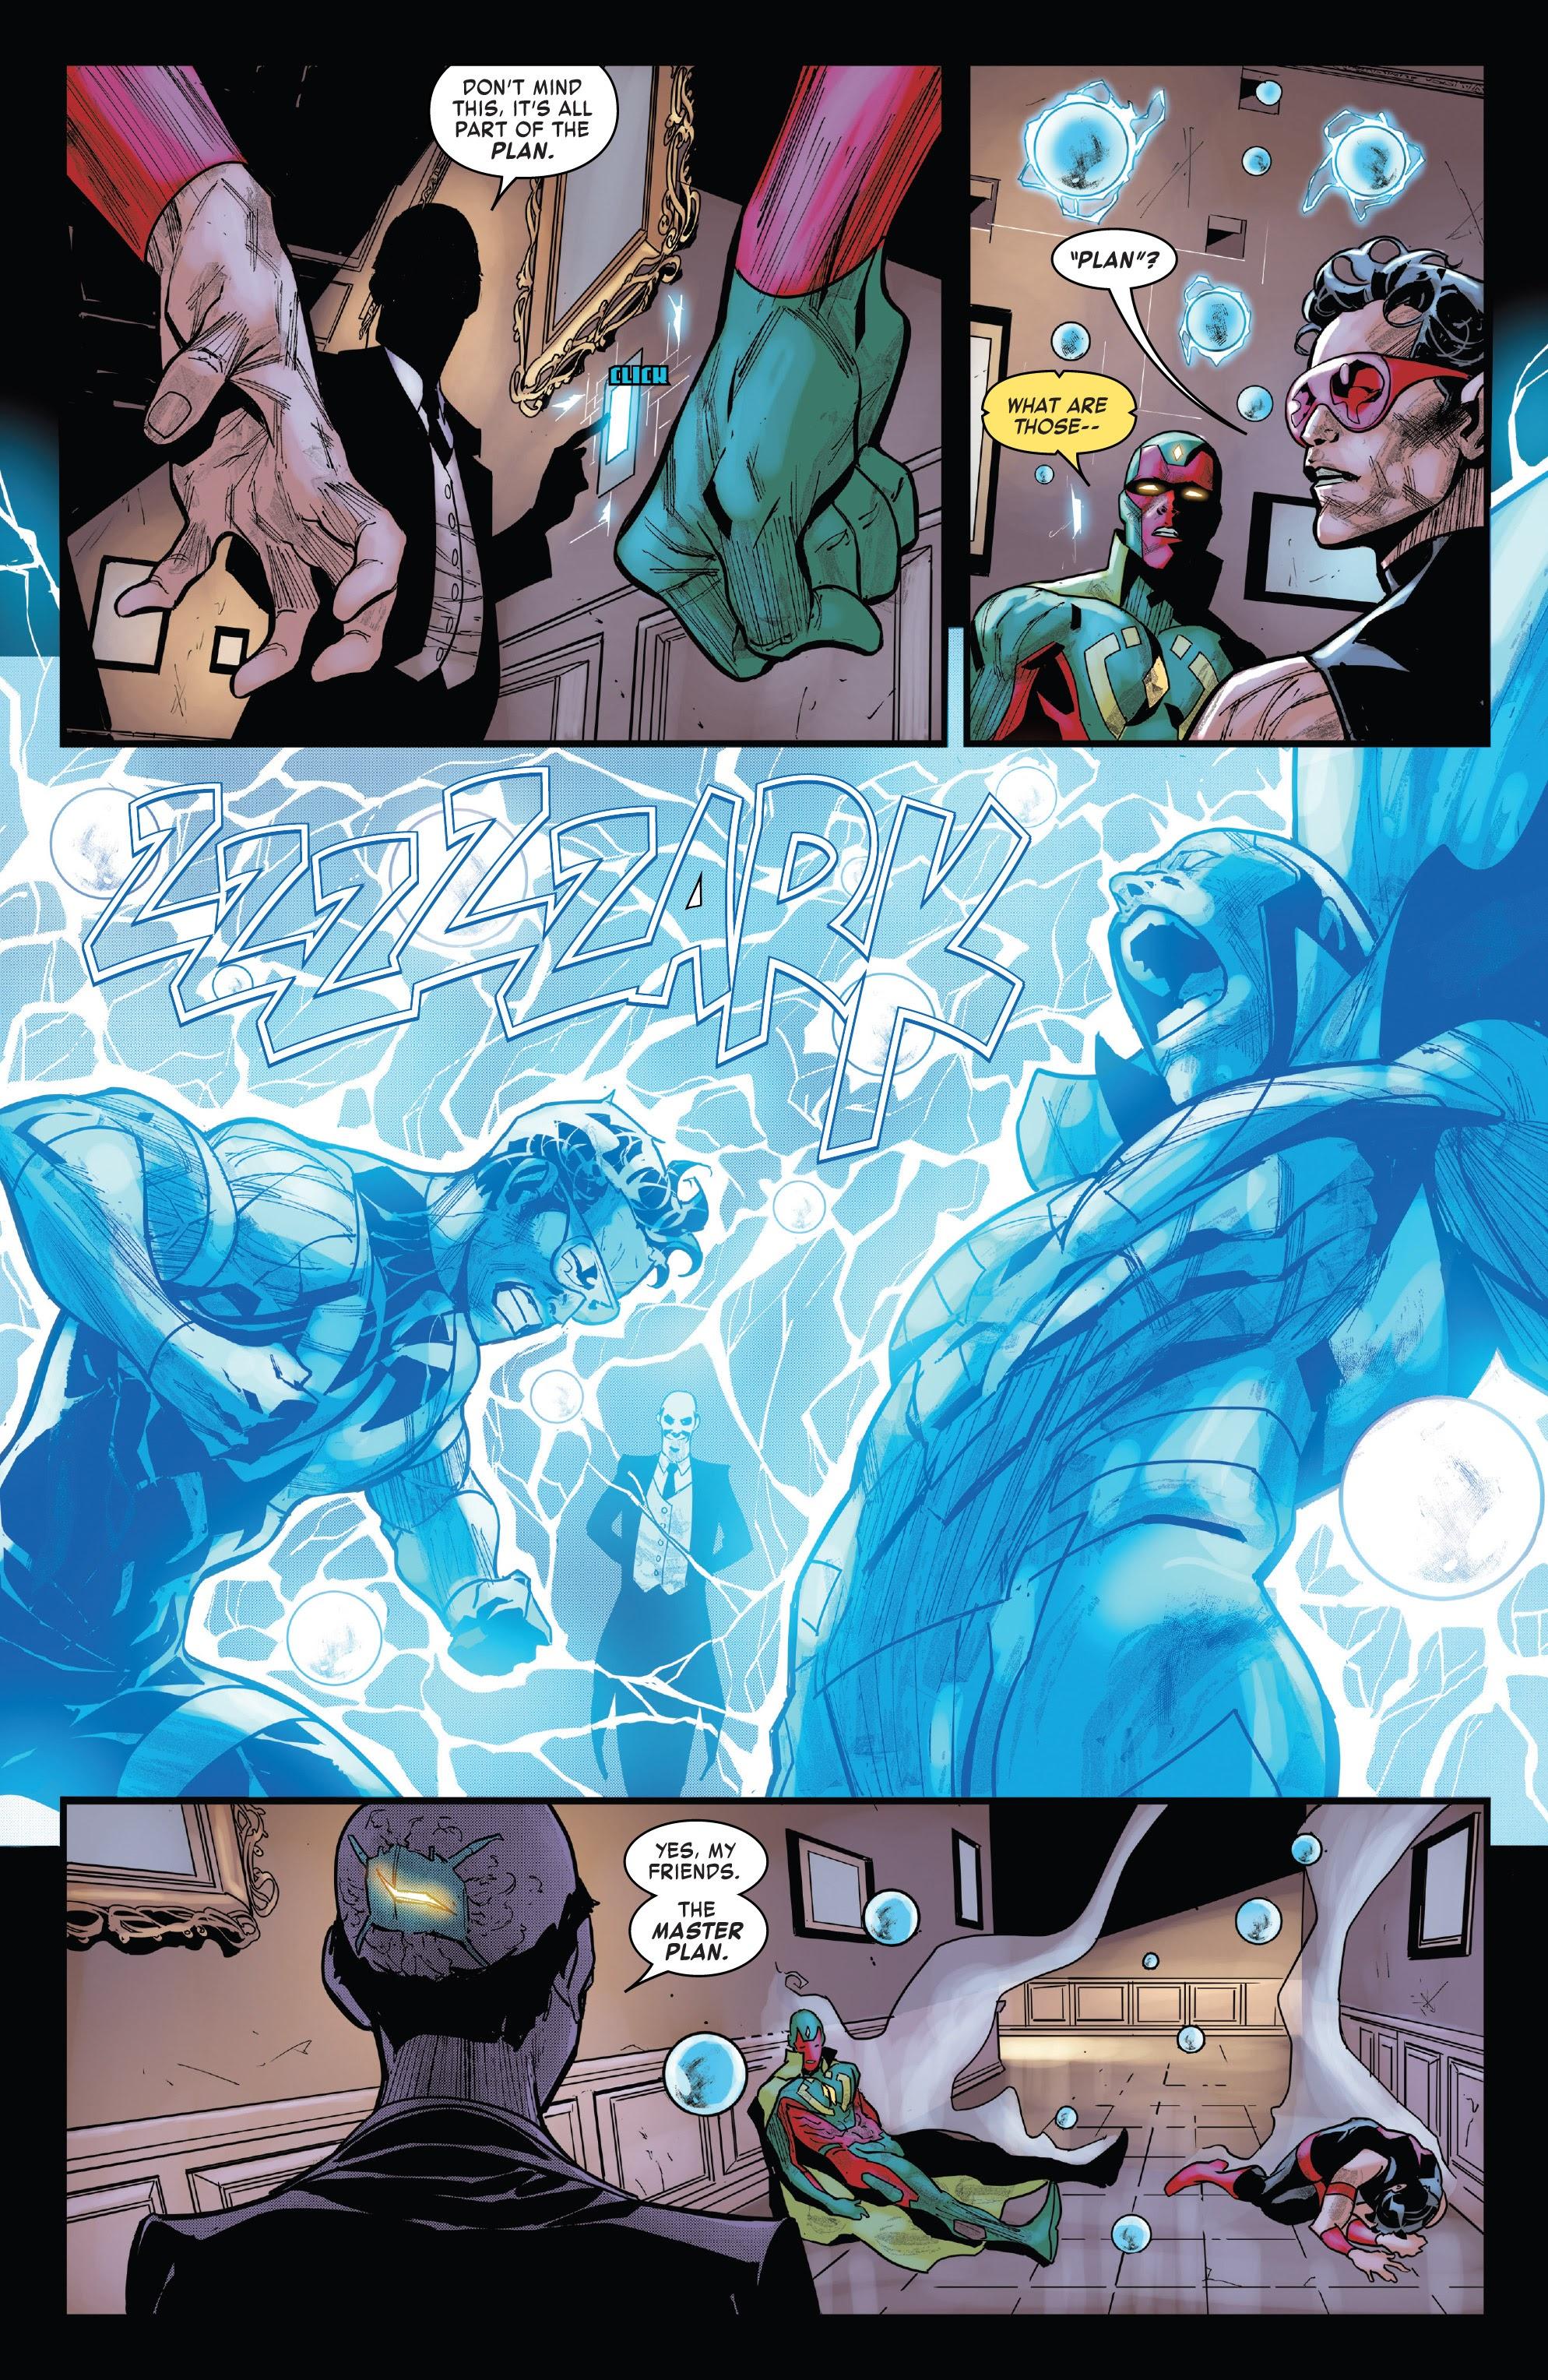 Read online Tony Stark: Iron Man comic -  Issue #15 - 10